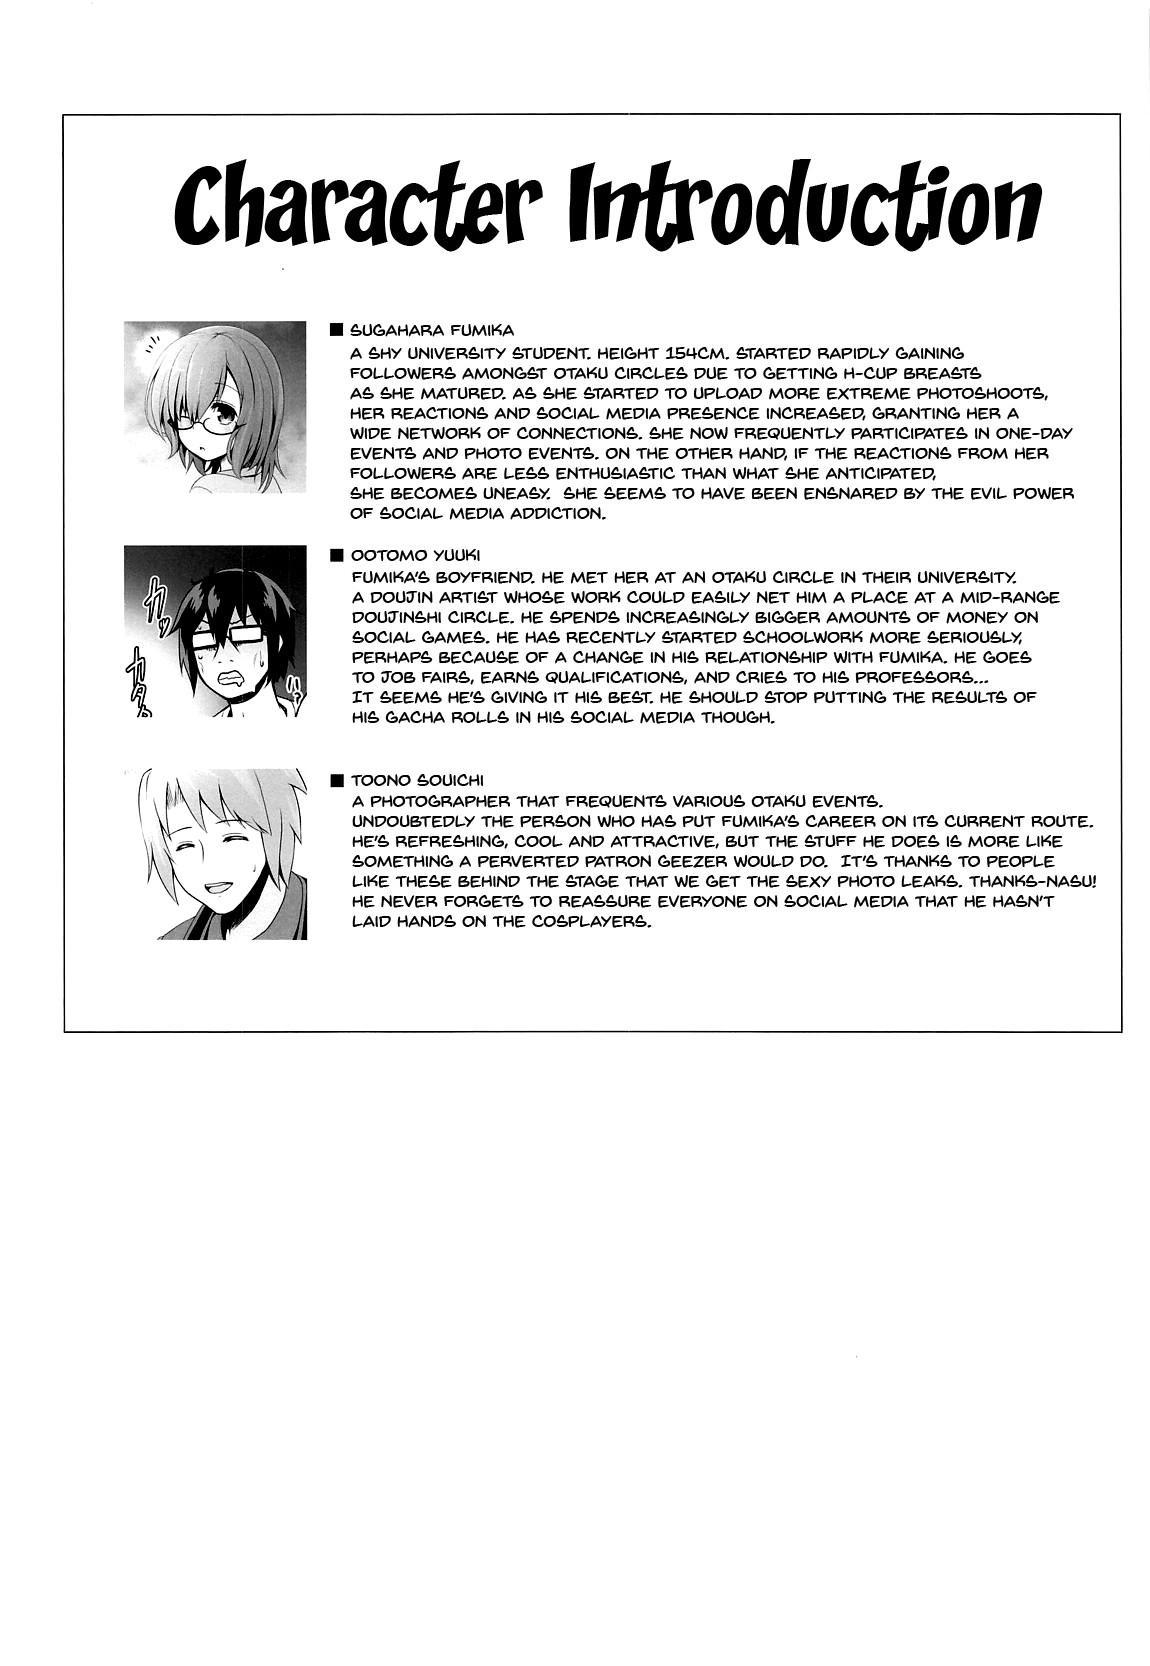 (COMIC1☆15) [SSB (Maririn)] Purupuru Yurasu H-Cup Namachichi Hobo Marudashi Layer Icha Love Rojou CosEve Date | making love to a cosplayer with large swaying h-cup breasts at a cosplay event (Fate/Grand Order) [English] {Doujins.com} 2